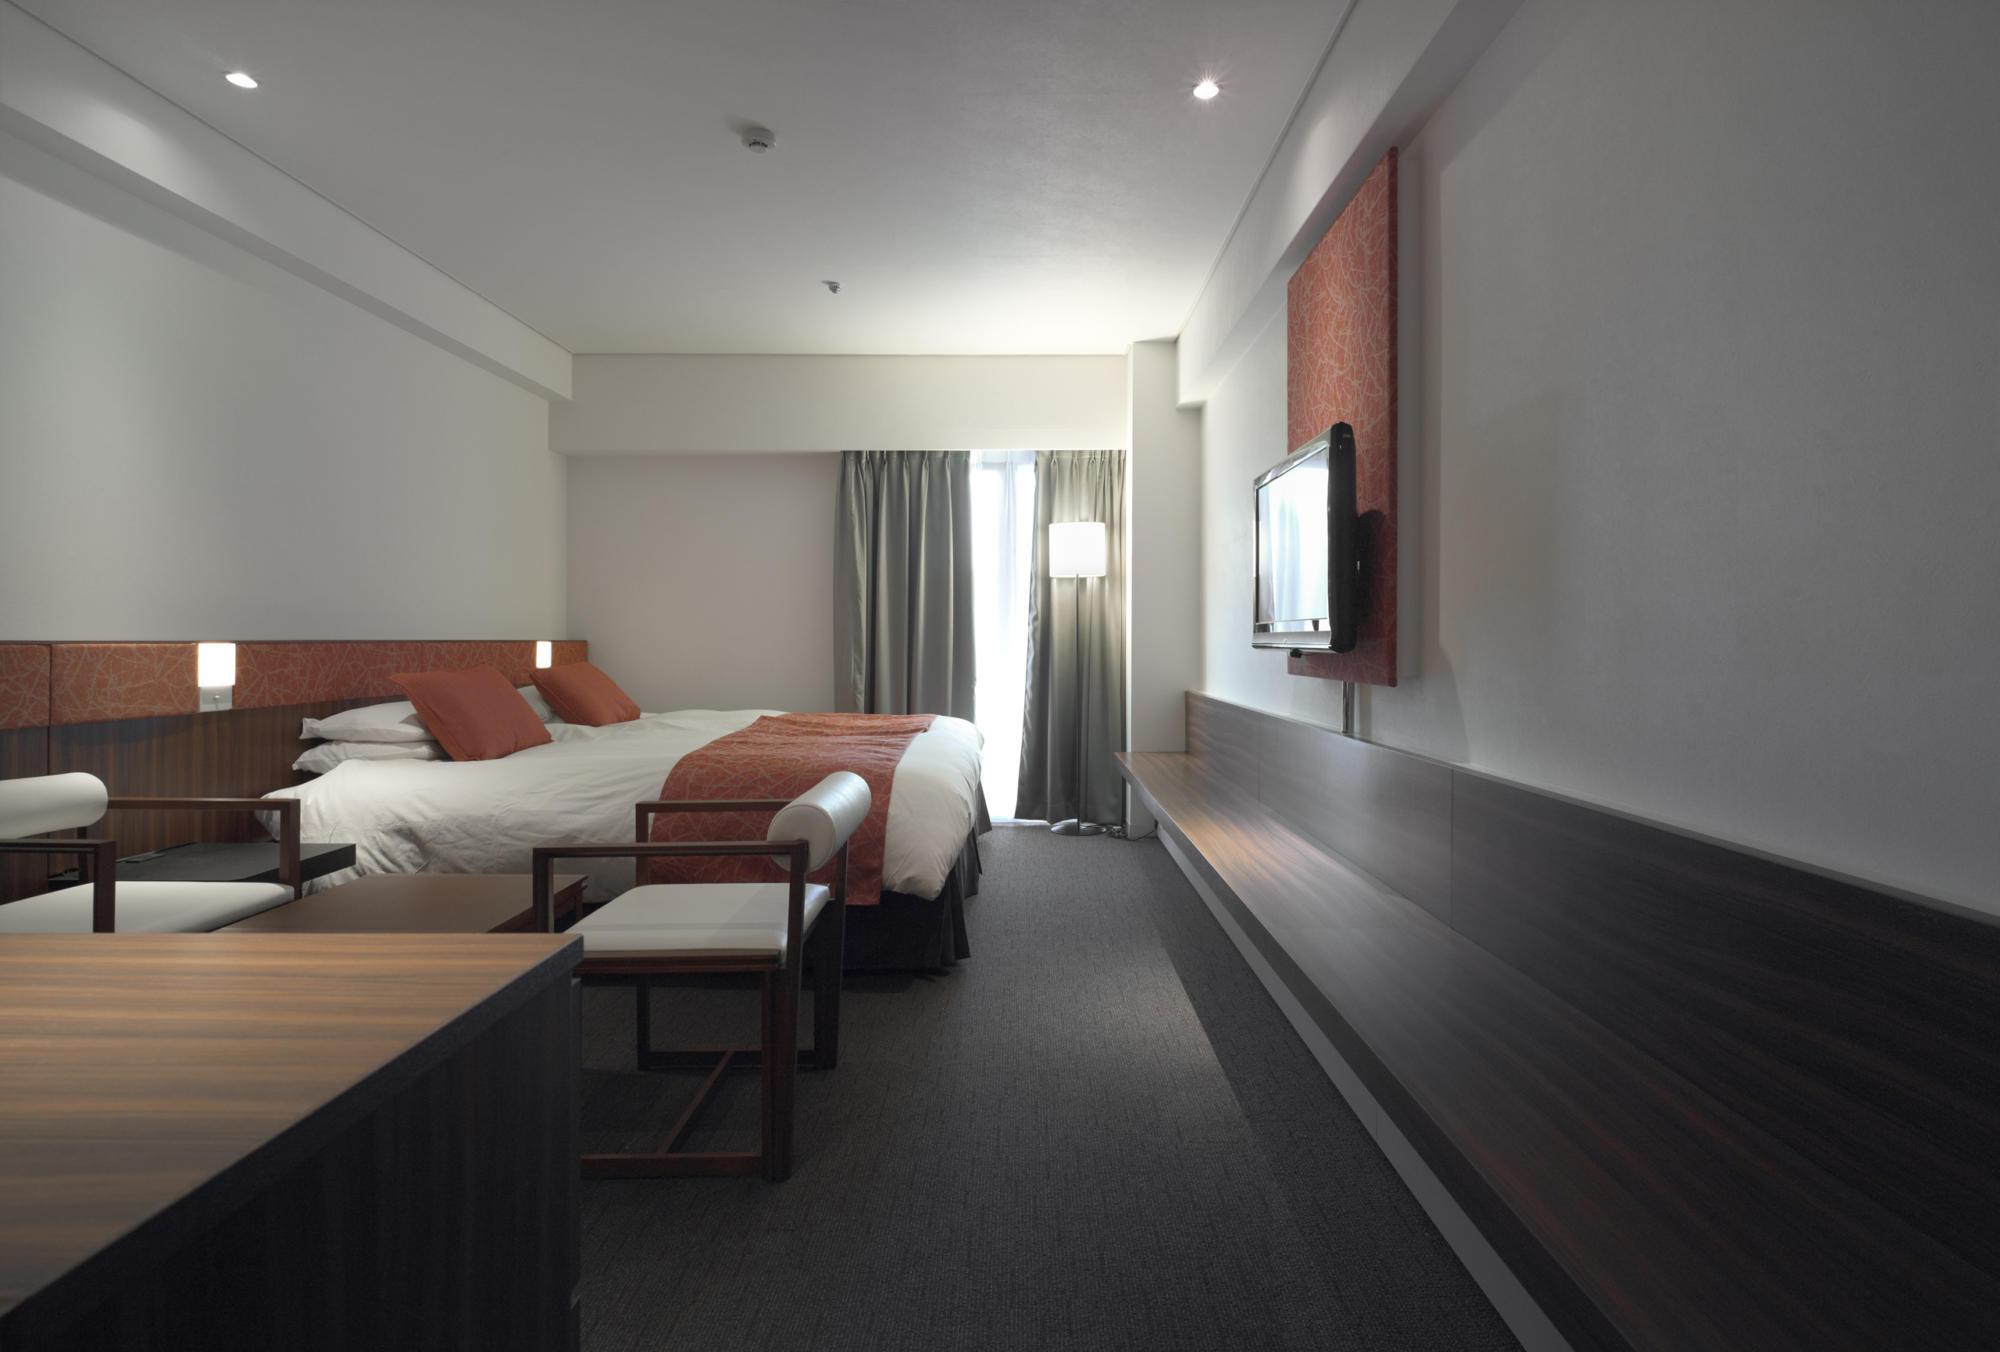 Kyoto Tokyu Hotel 4F-6F Room Renovation | WORKS |